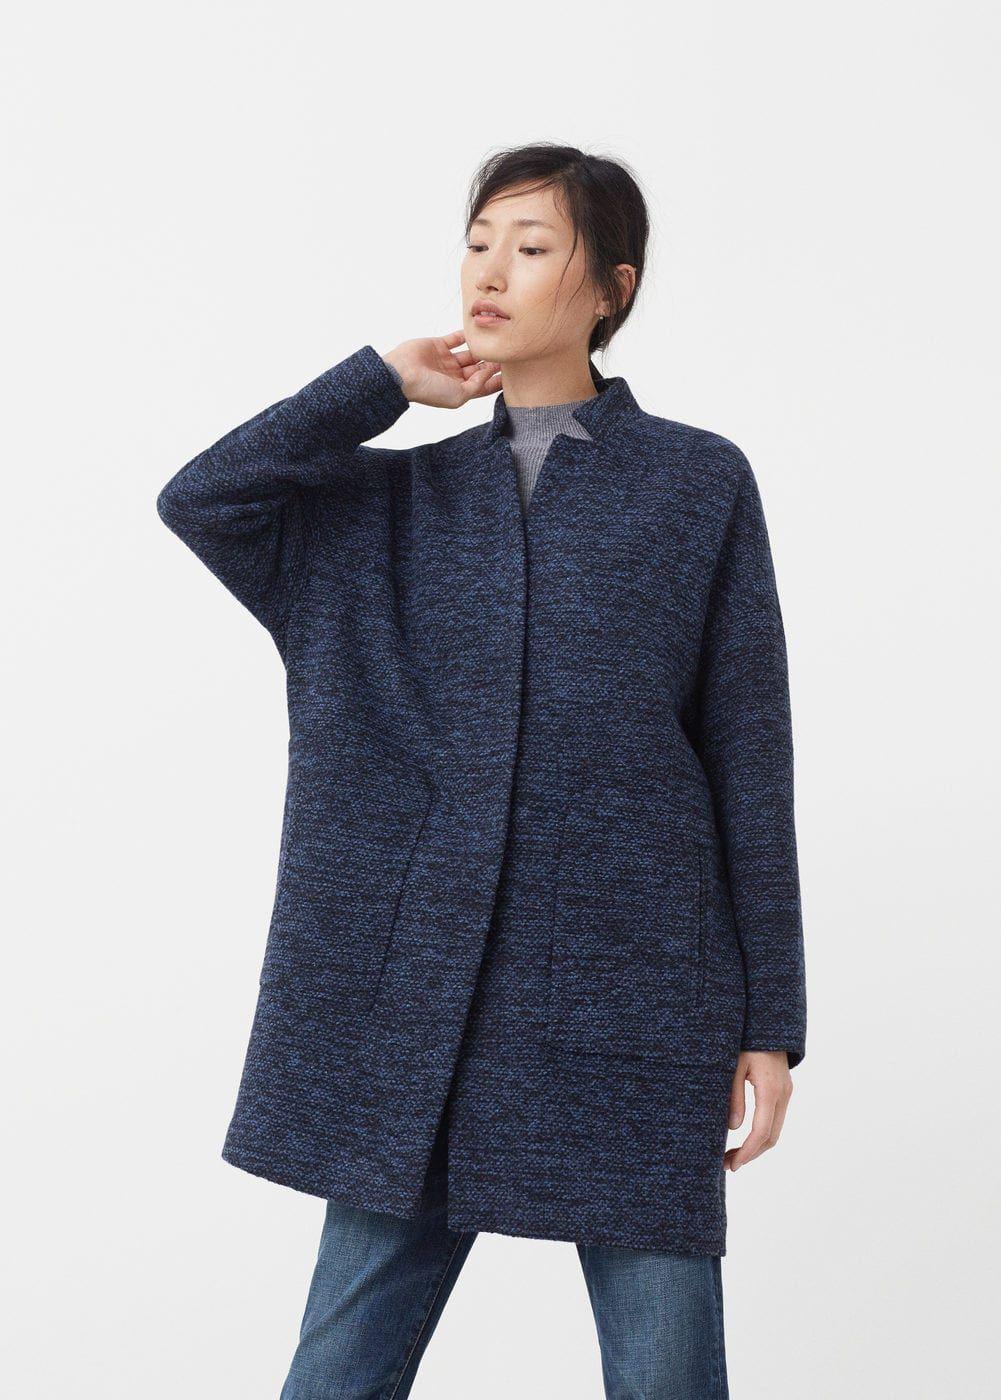 e9e936be96 Cappotto lana cotone - Donna | Styling ego | Manteau laine, Manteau ...